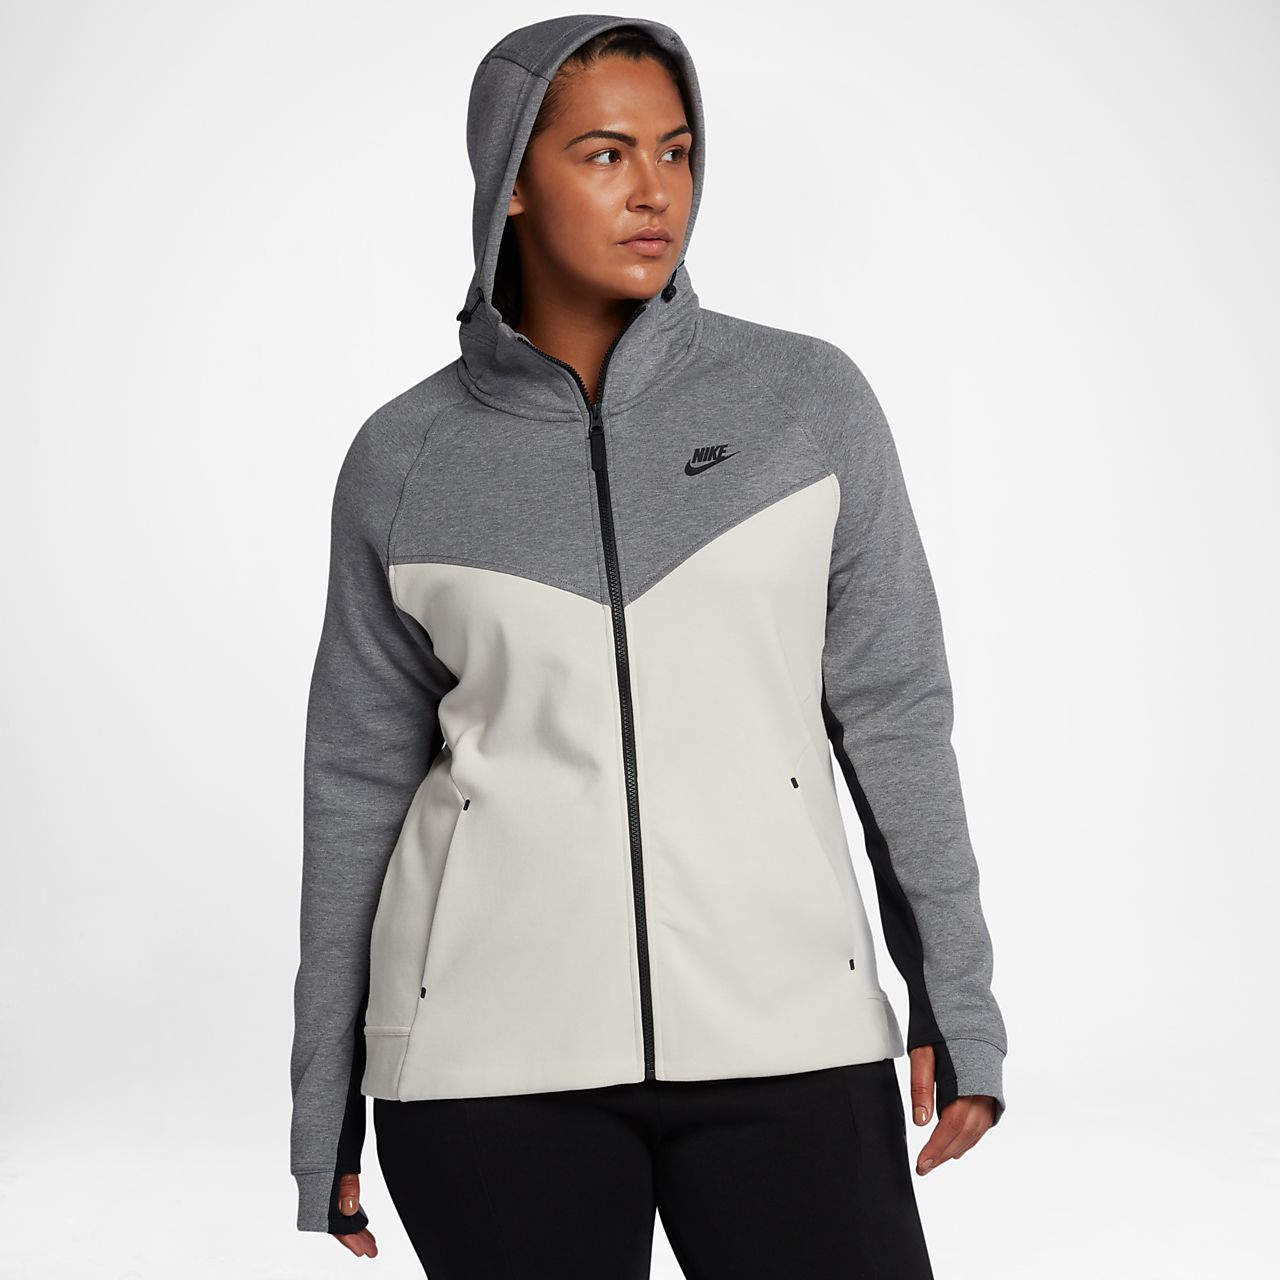 Nike Jackets for Women